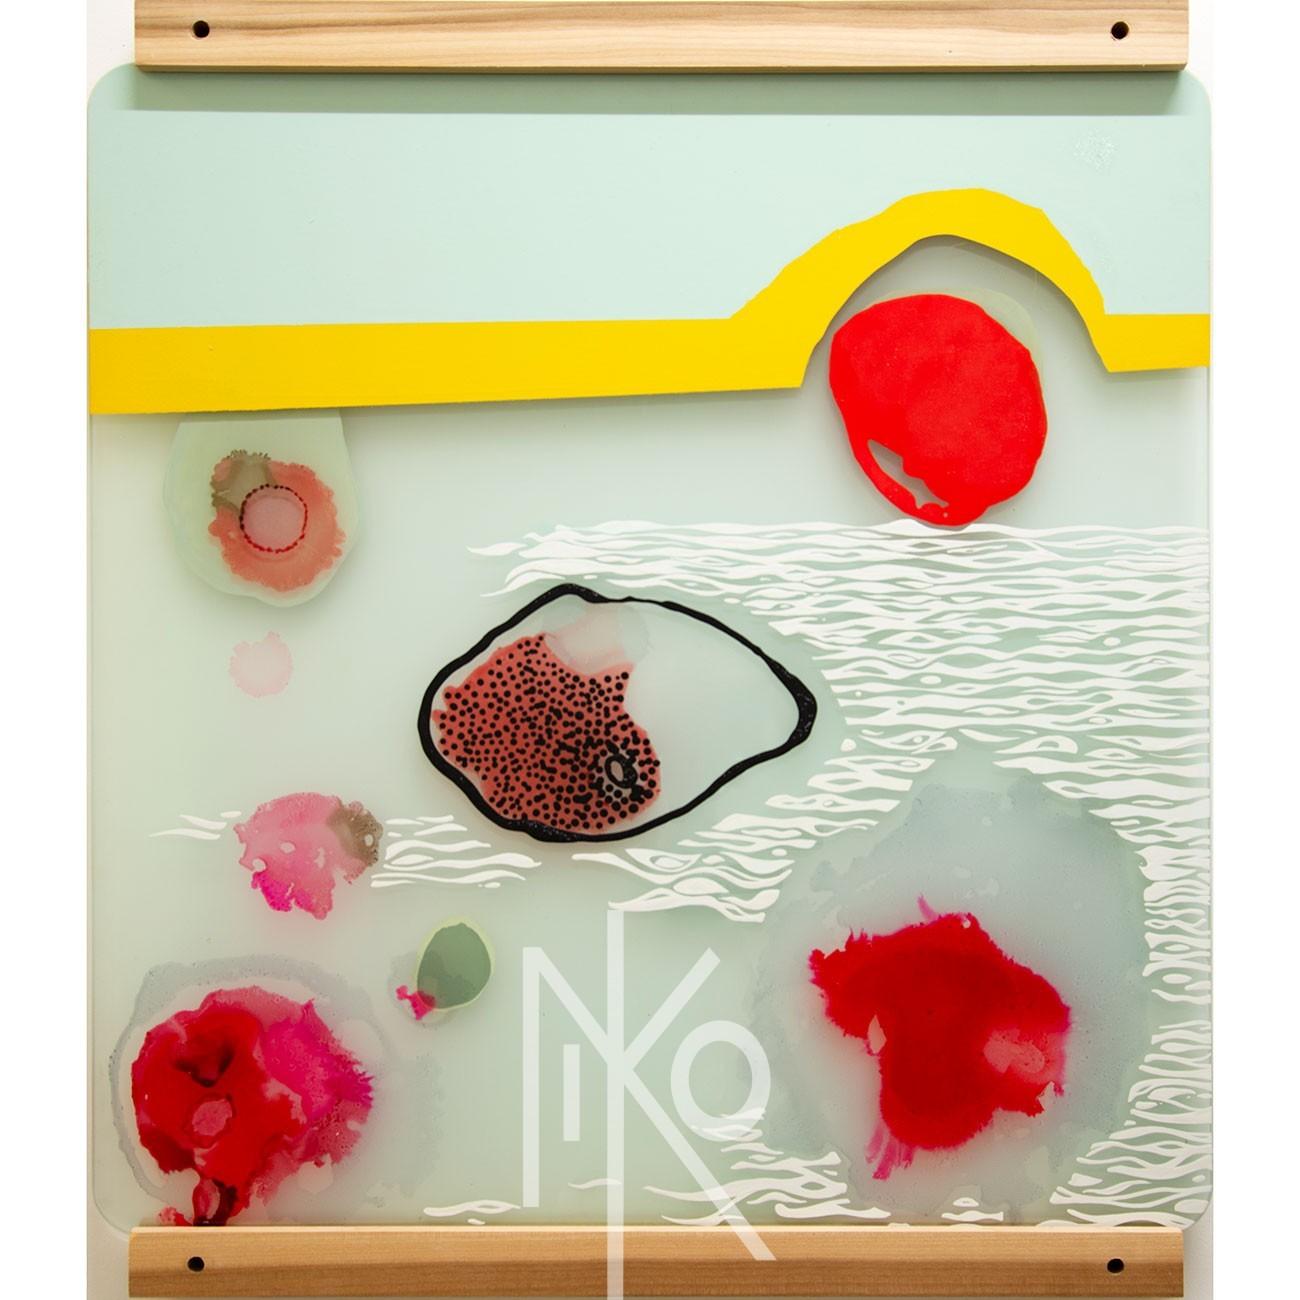 Micro Slide #5 Painting by Niko Yulis